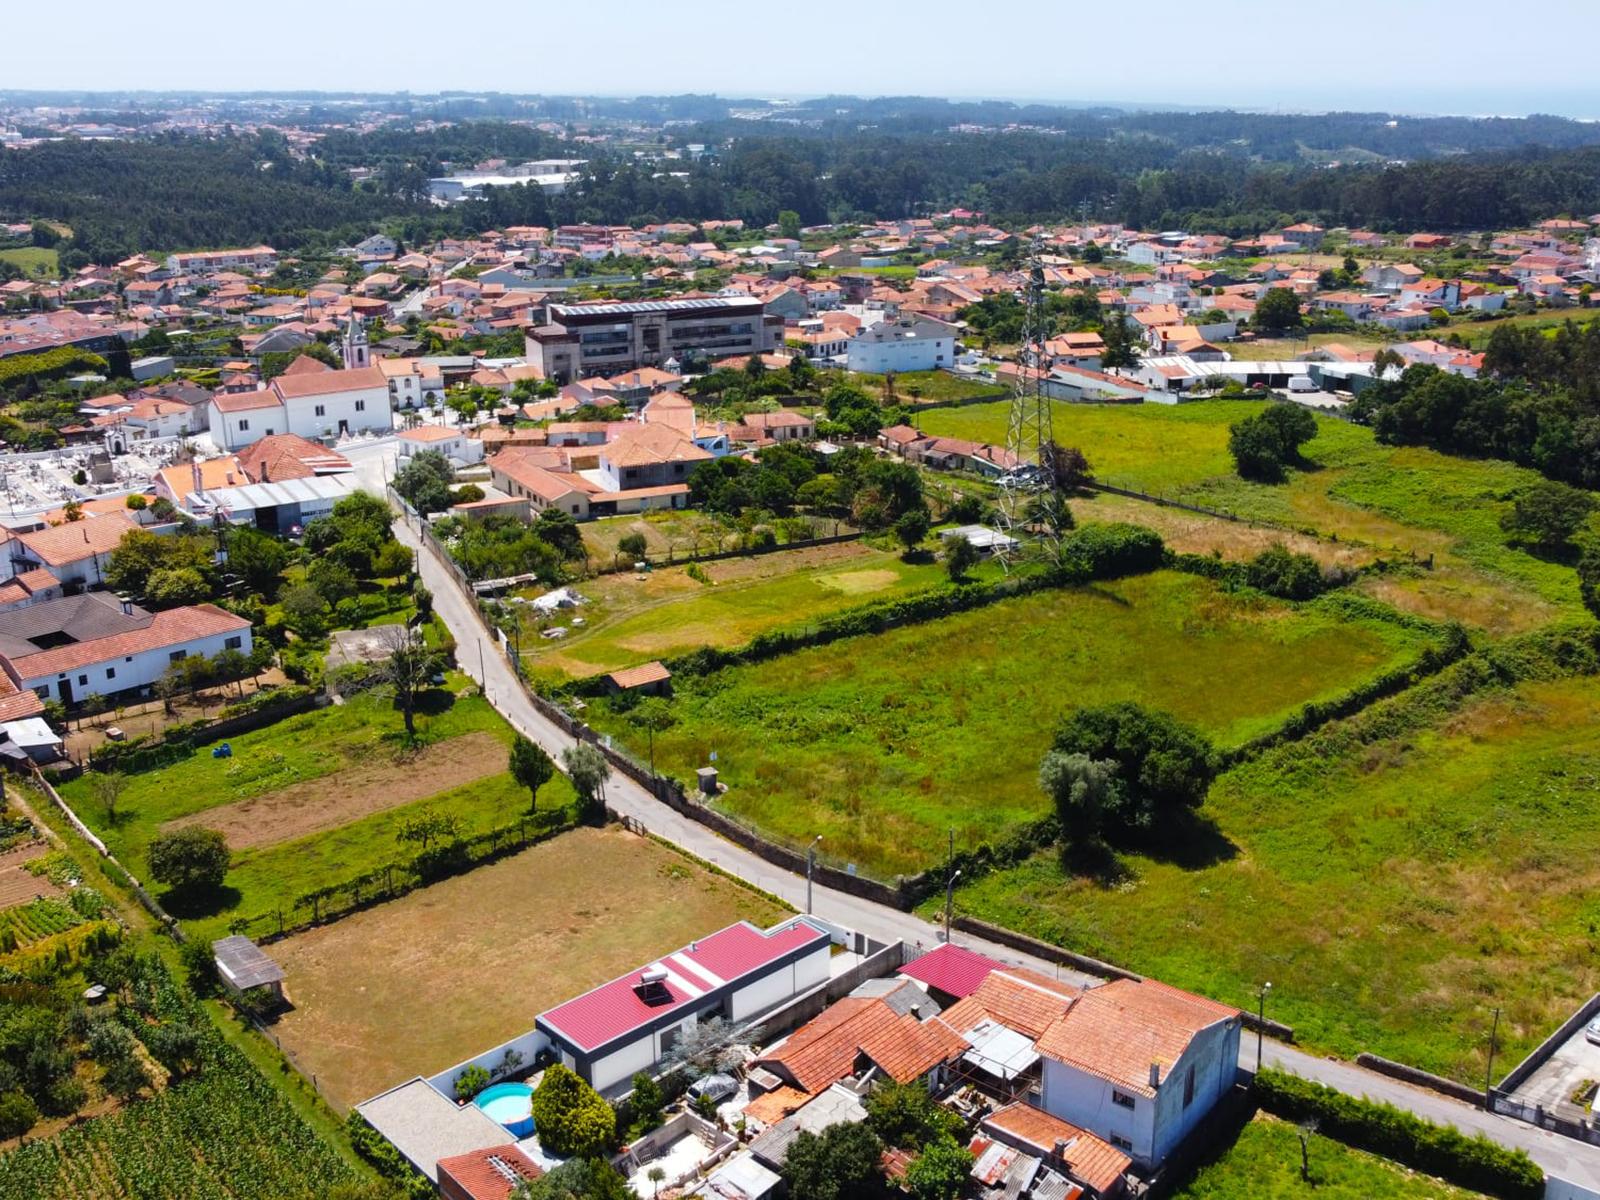 Inproject Land in Nogueira da Regedoura –